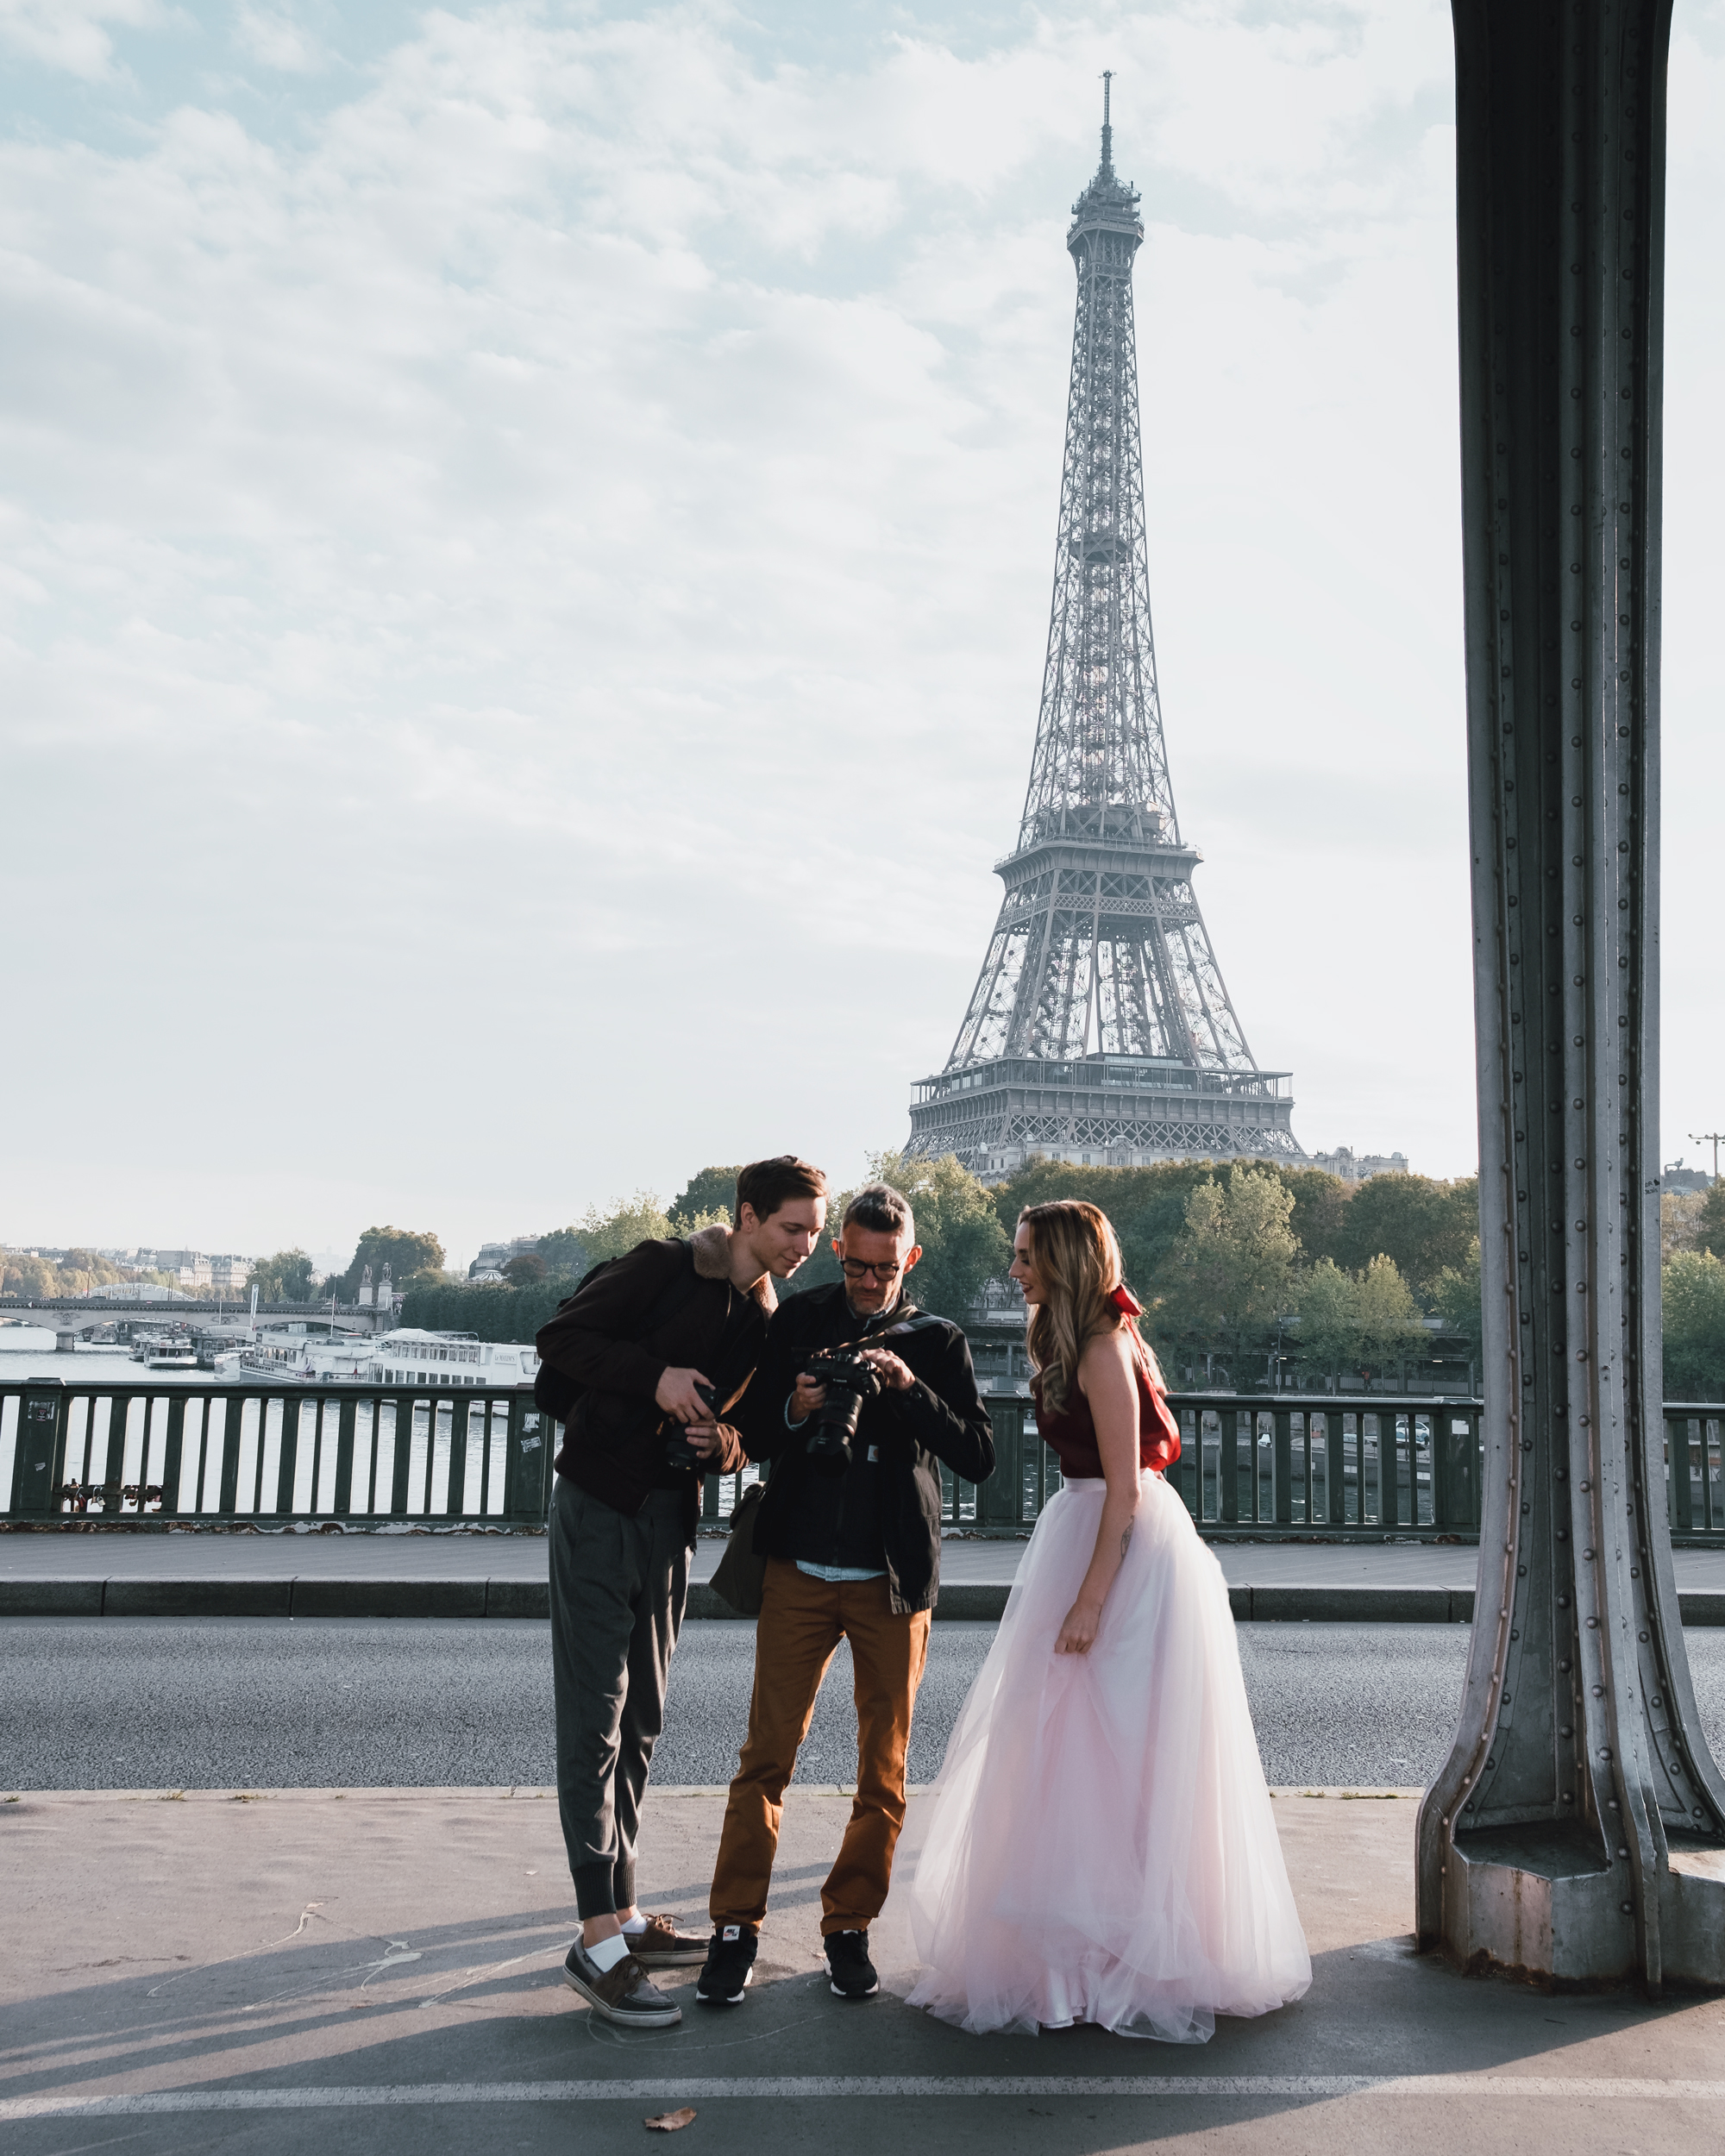 FRANKRIKE+paris+bridal